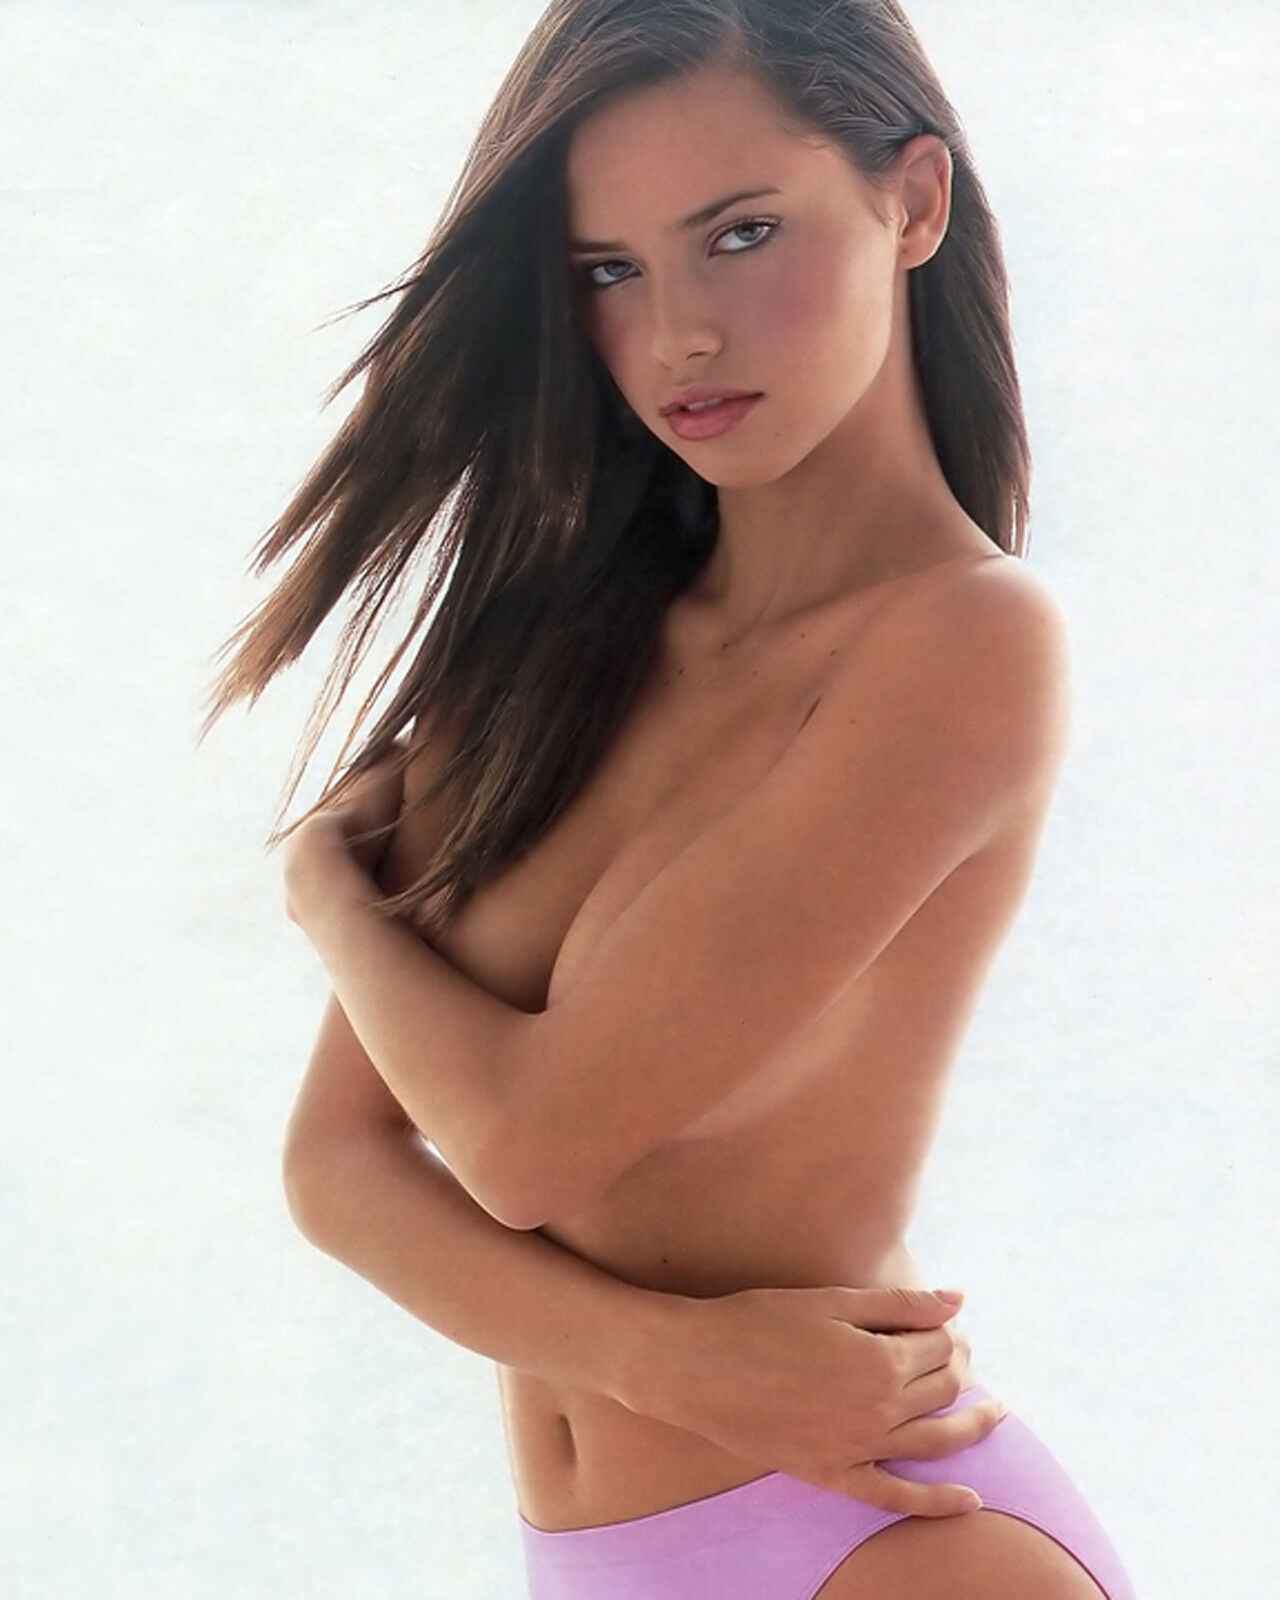 Adriana lima 8x10 celebrity photo picture hot sexy 55